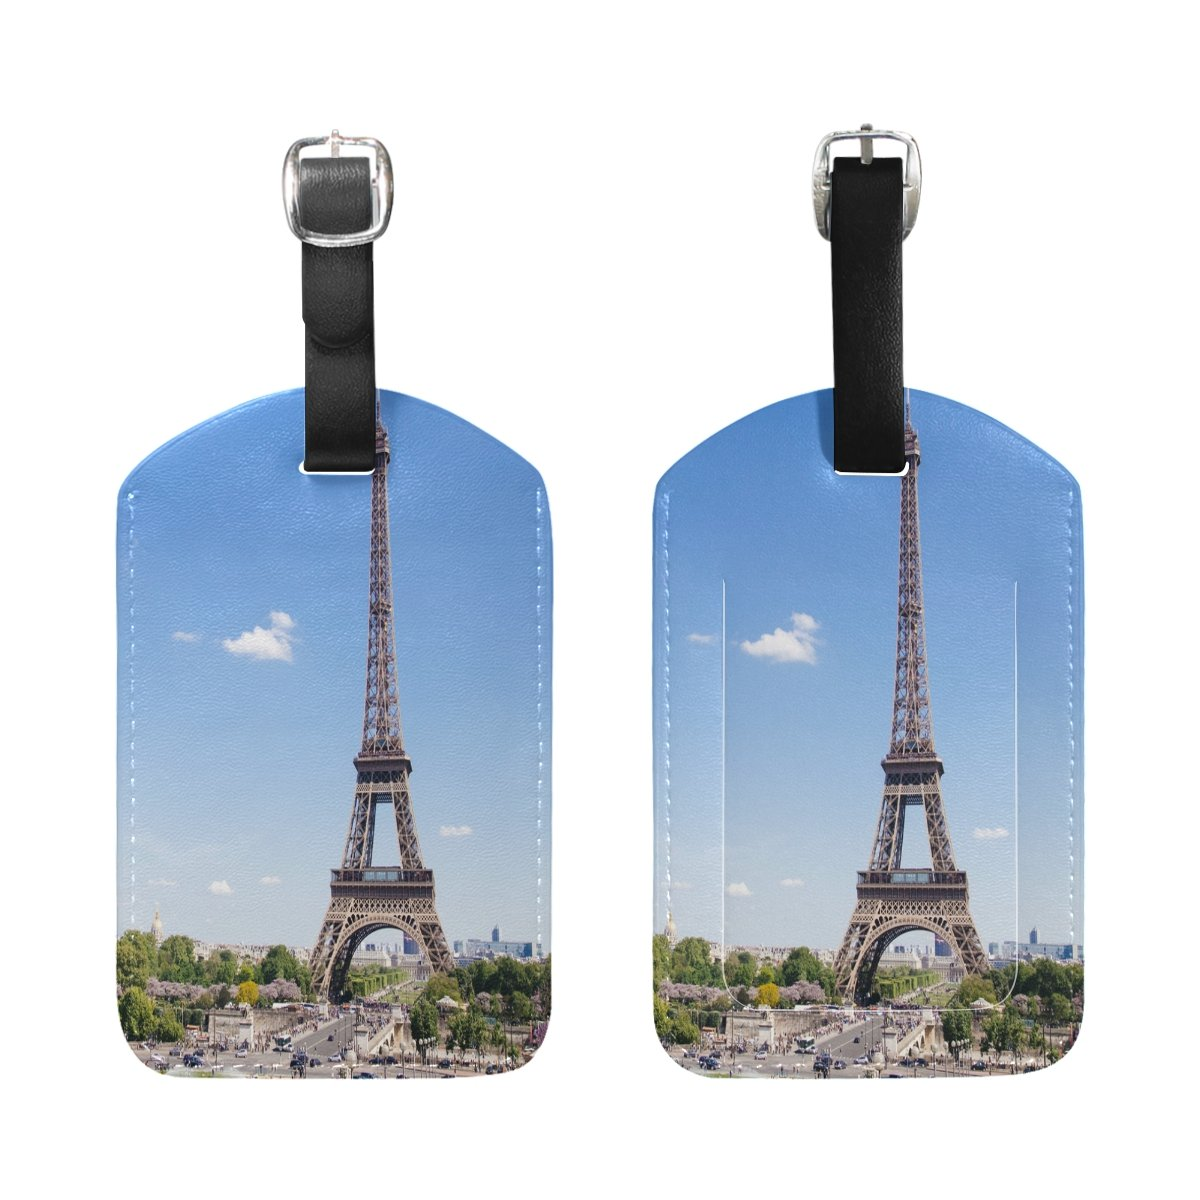 1Pcs Saobao Travel Luggage Tag France Eiffel Tower PU Leather Baggage Suitcase Travel ID Bag Tag